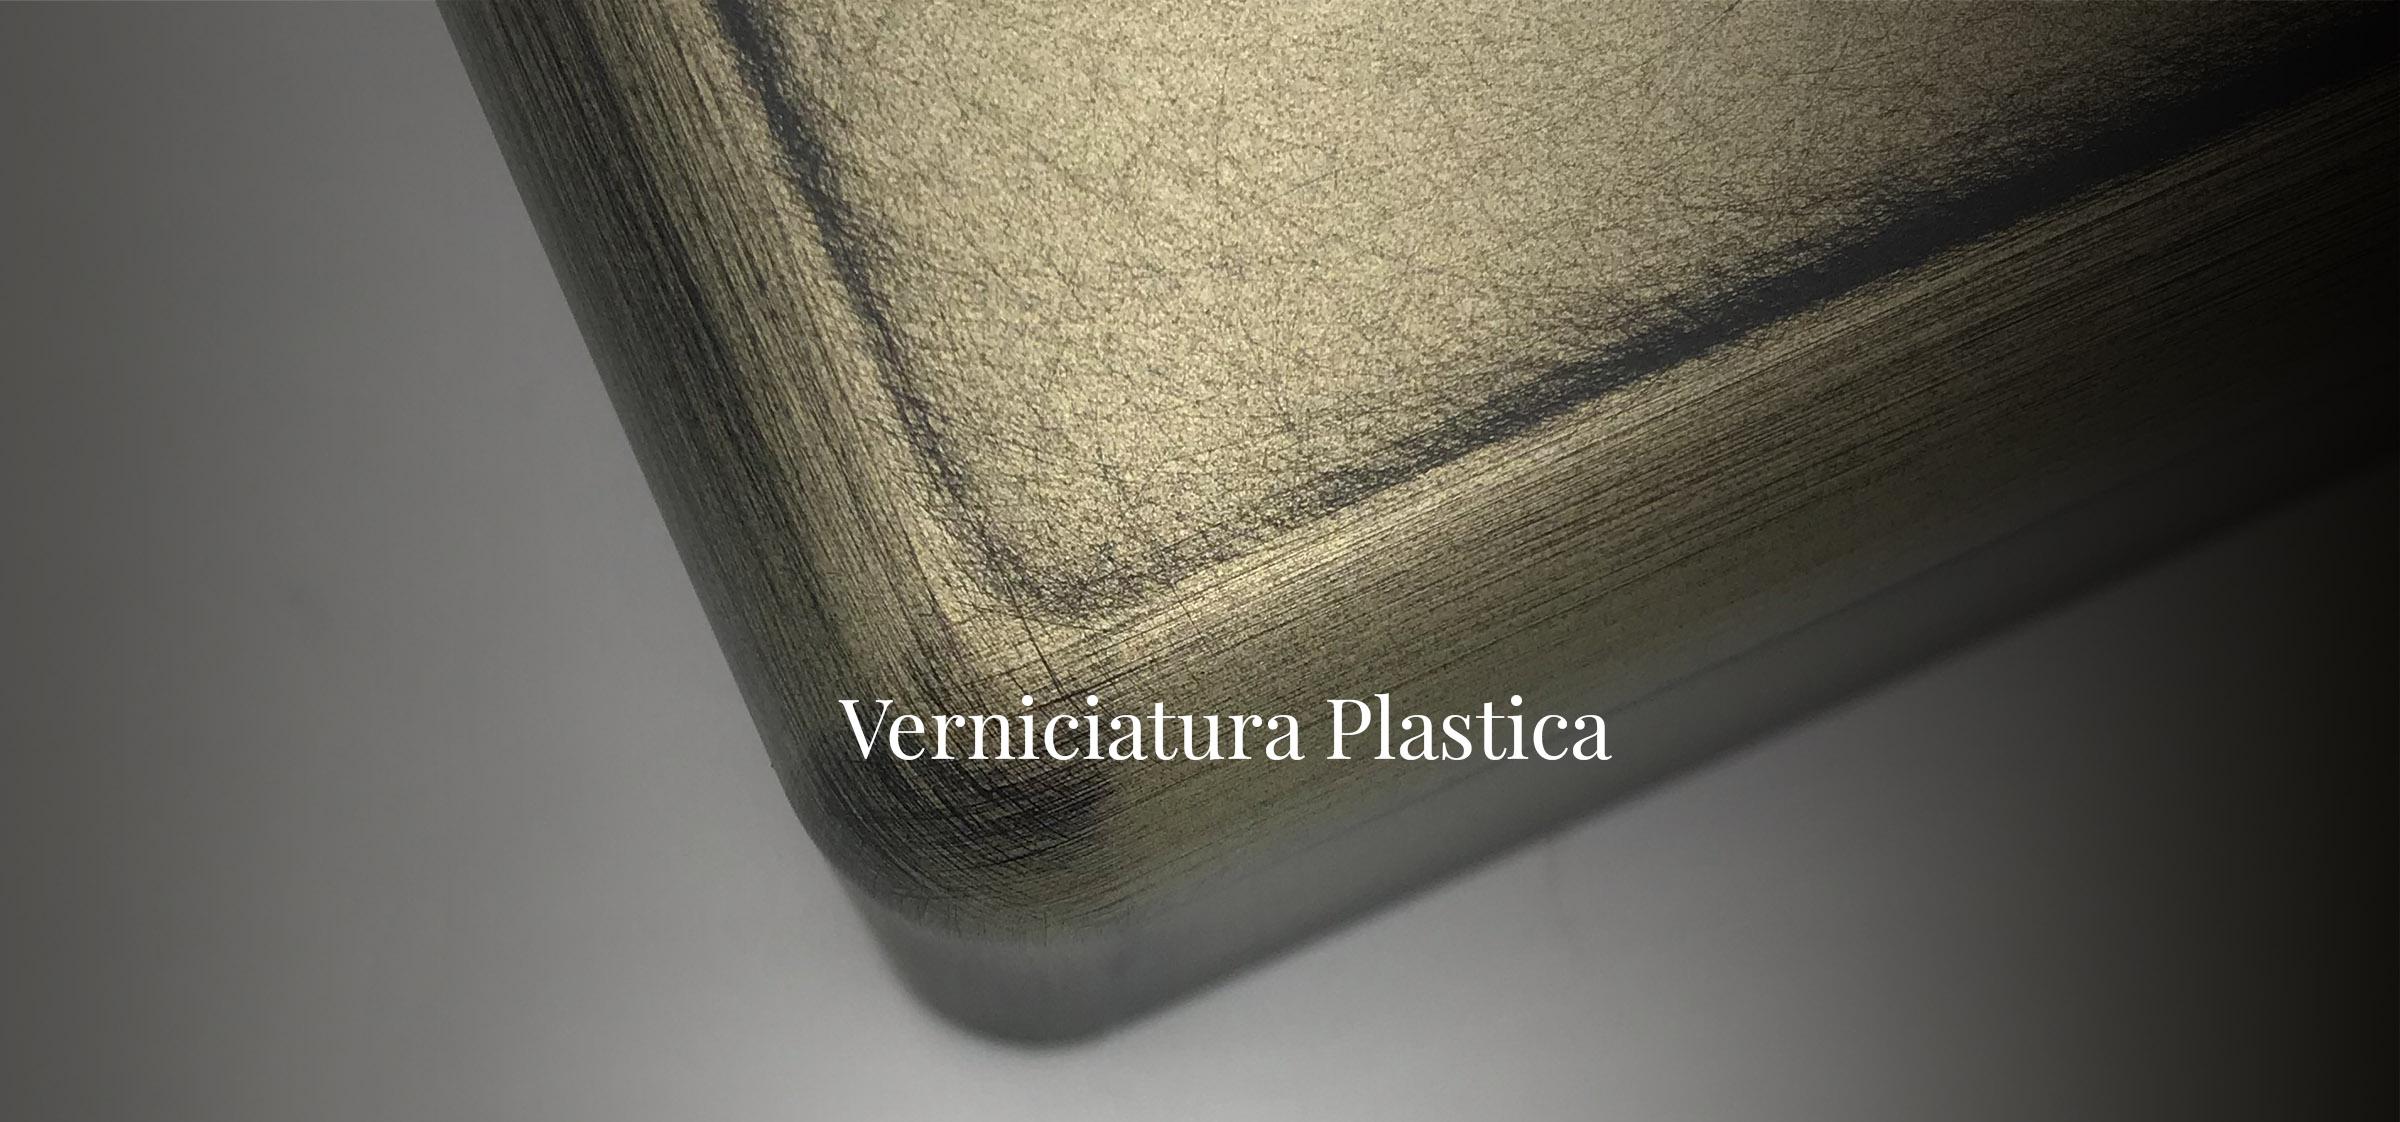 verniciatura-plastica